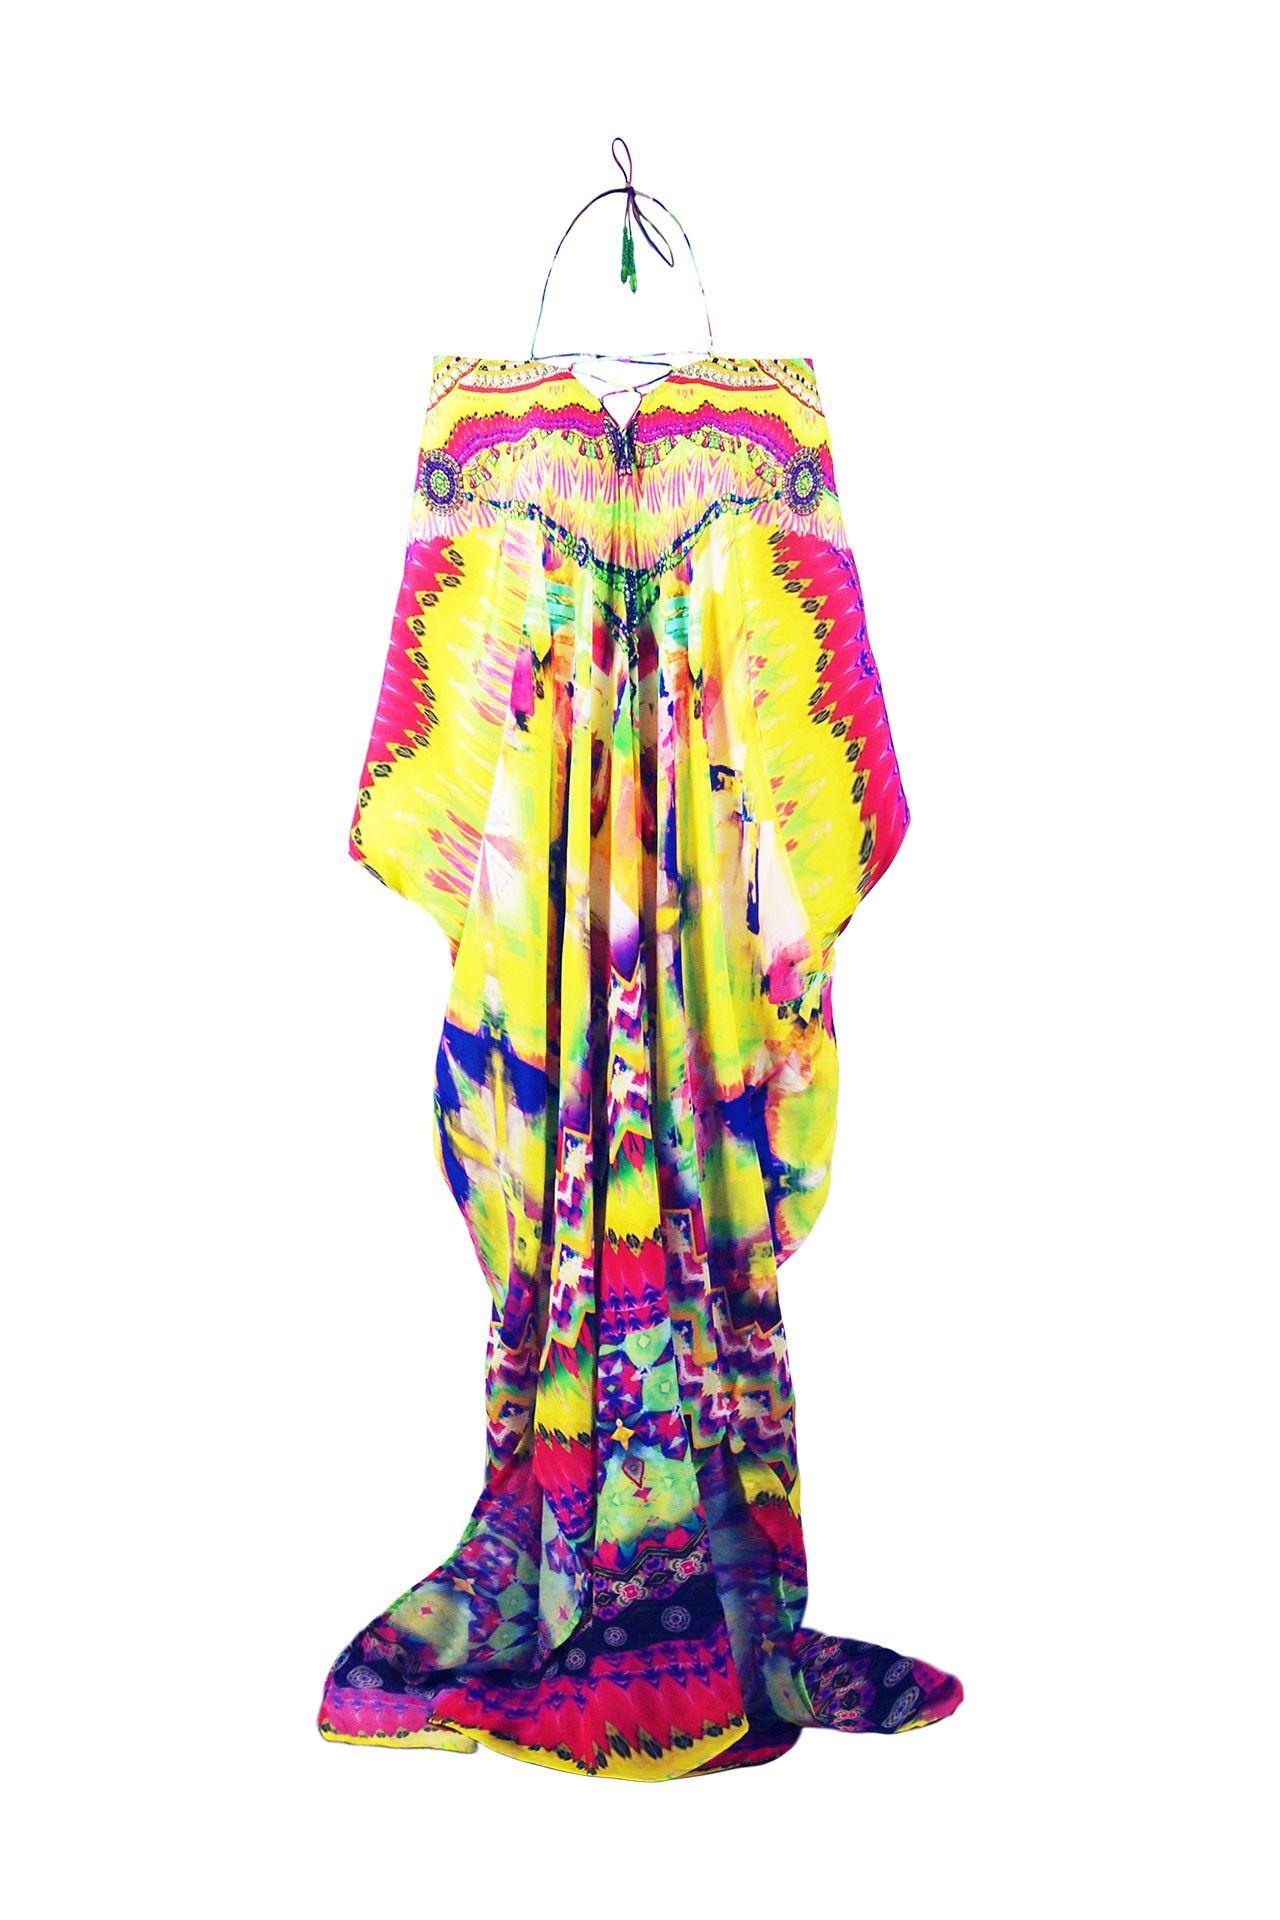 Shahida luxury lace up kaftan dress long maxi in yellow print